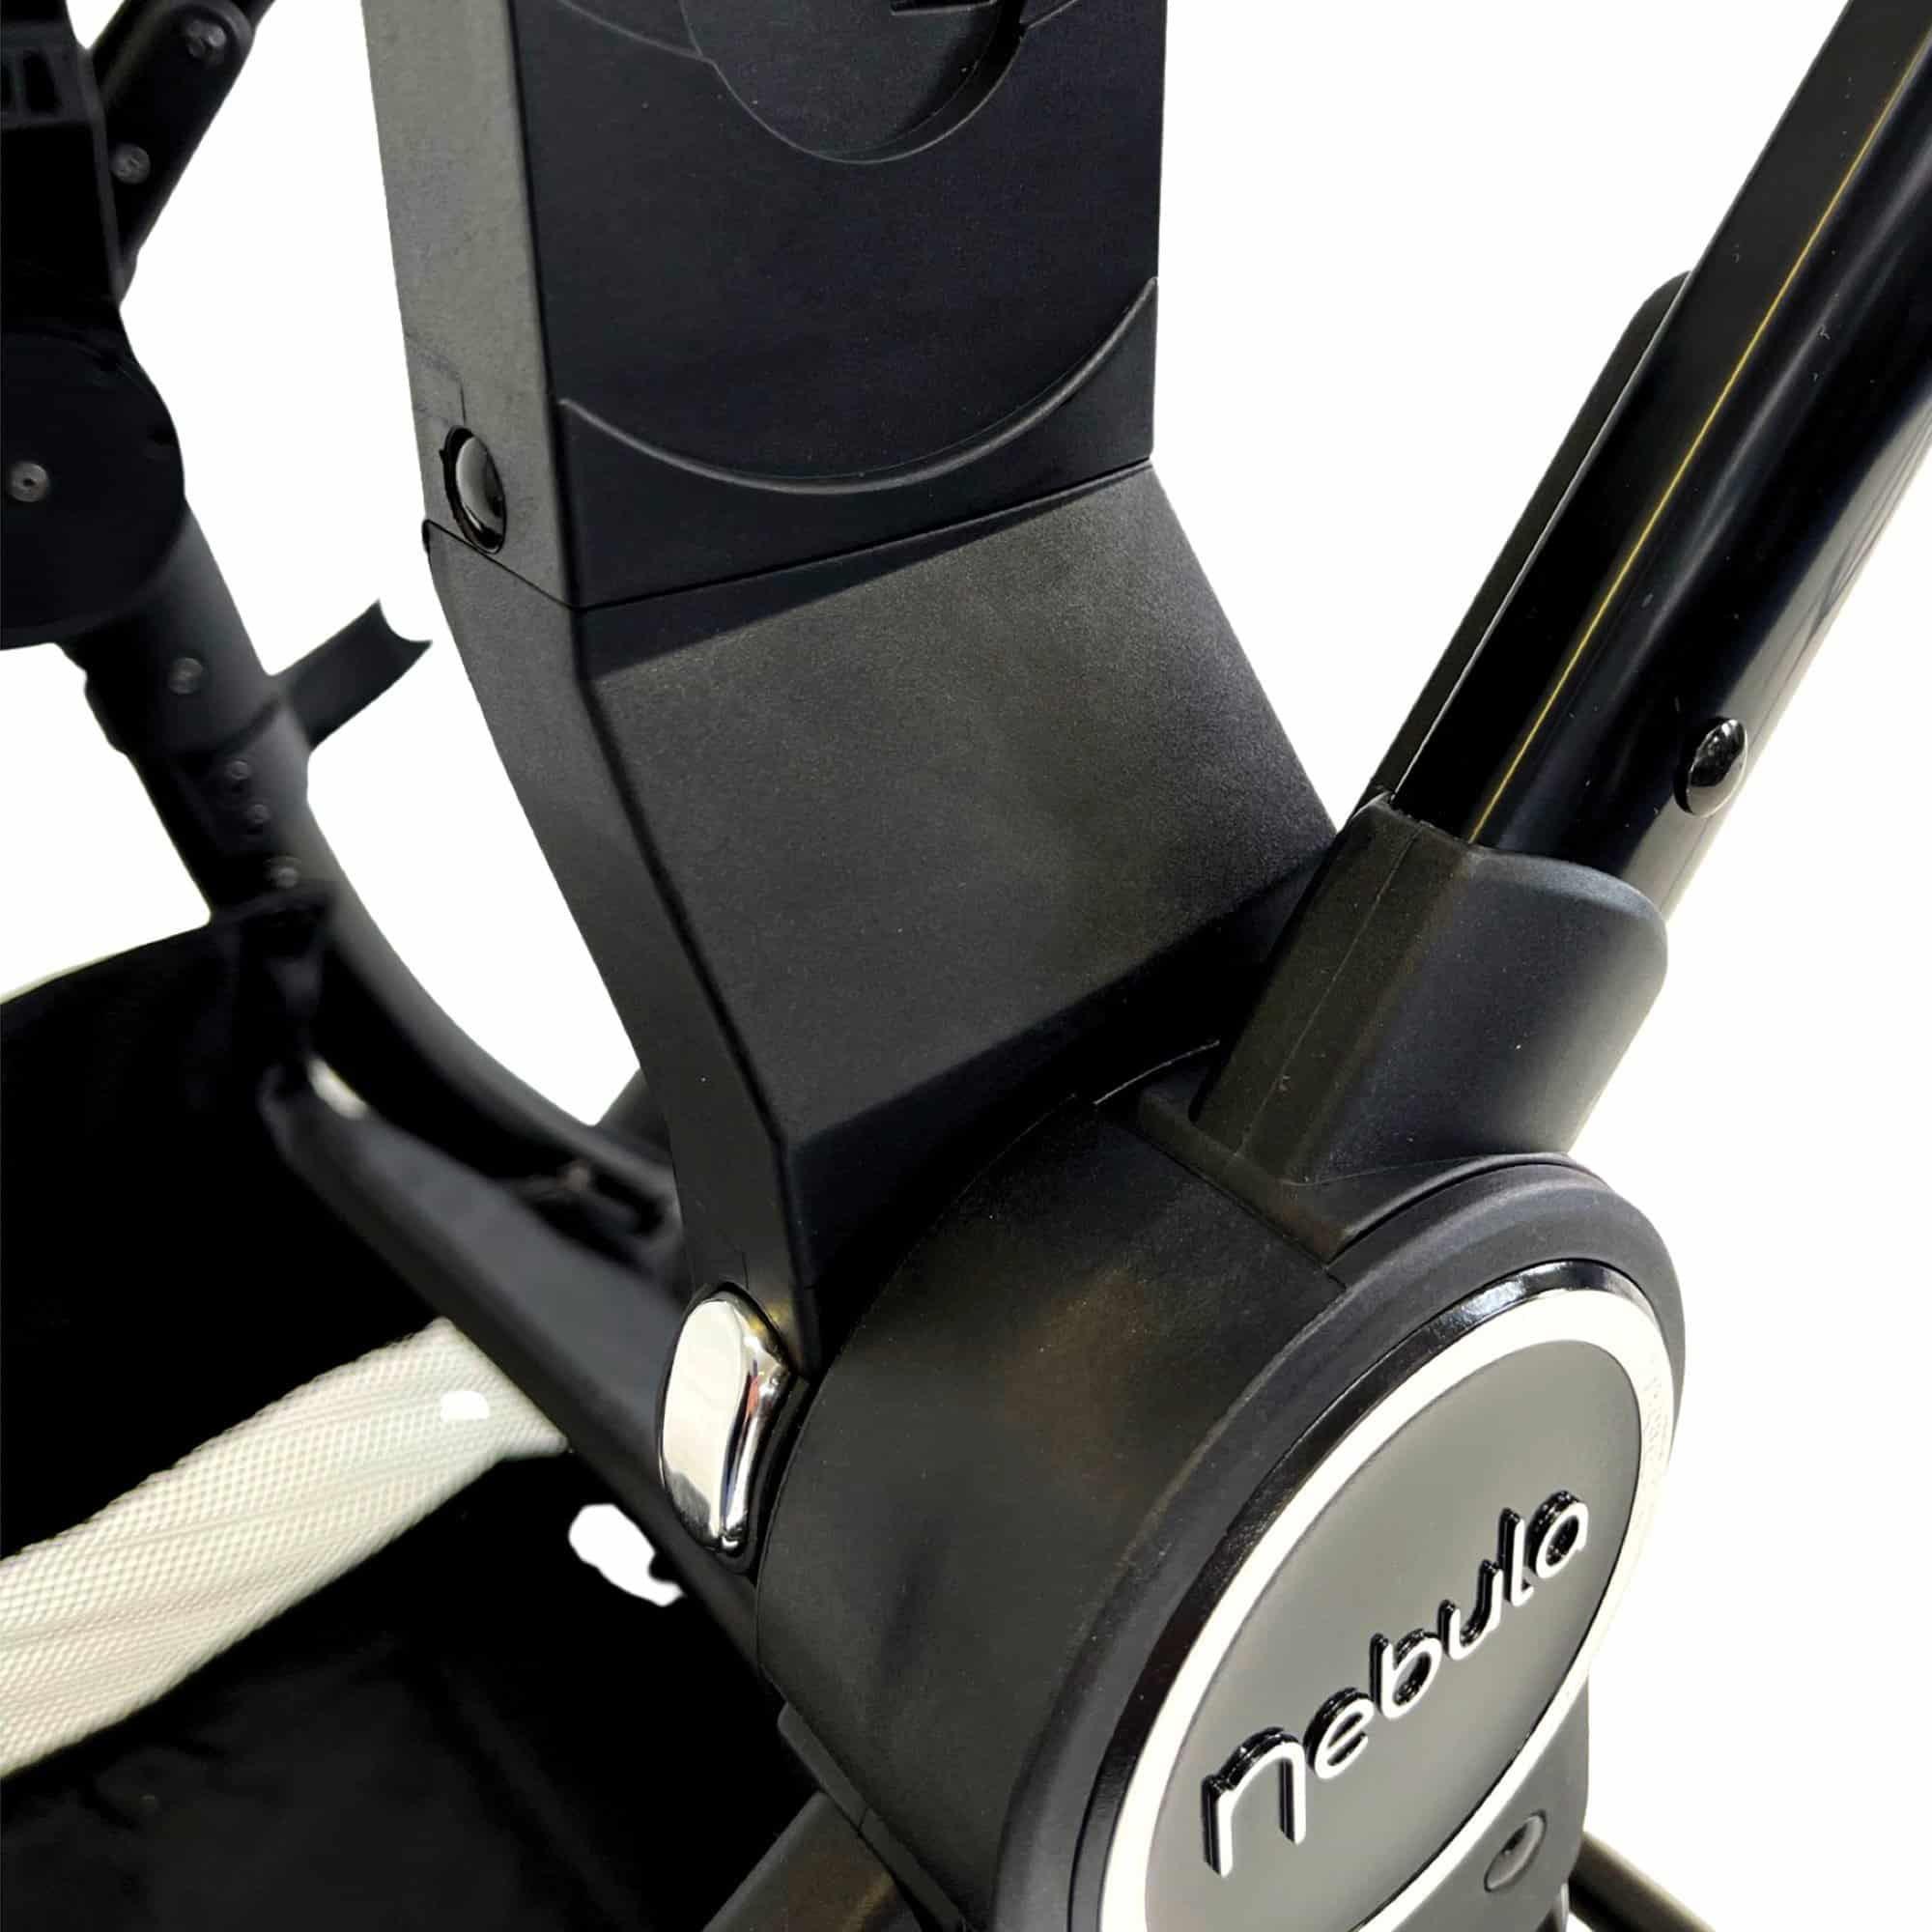 Nebula Car Seat Adapters on Product